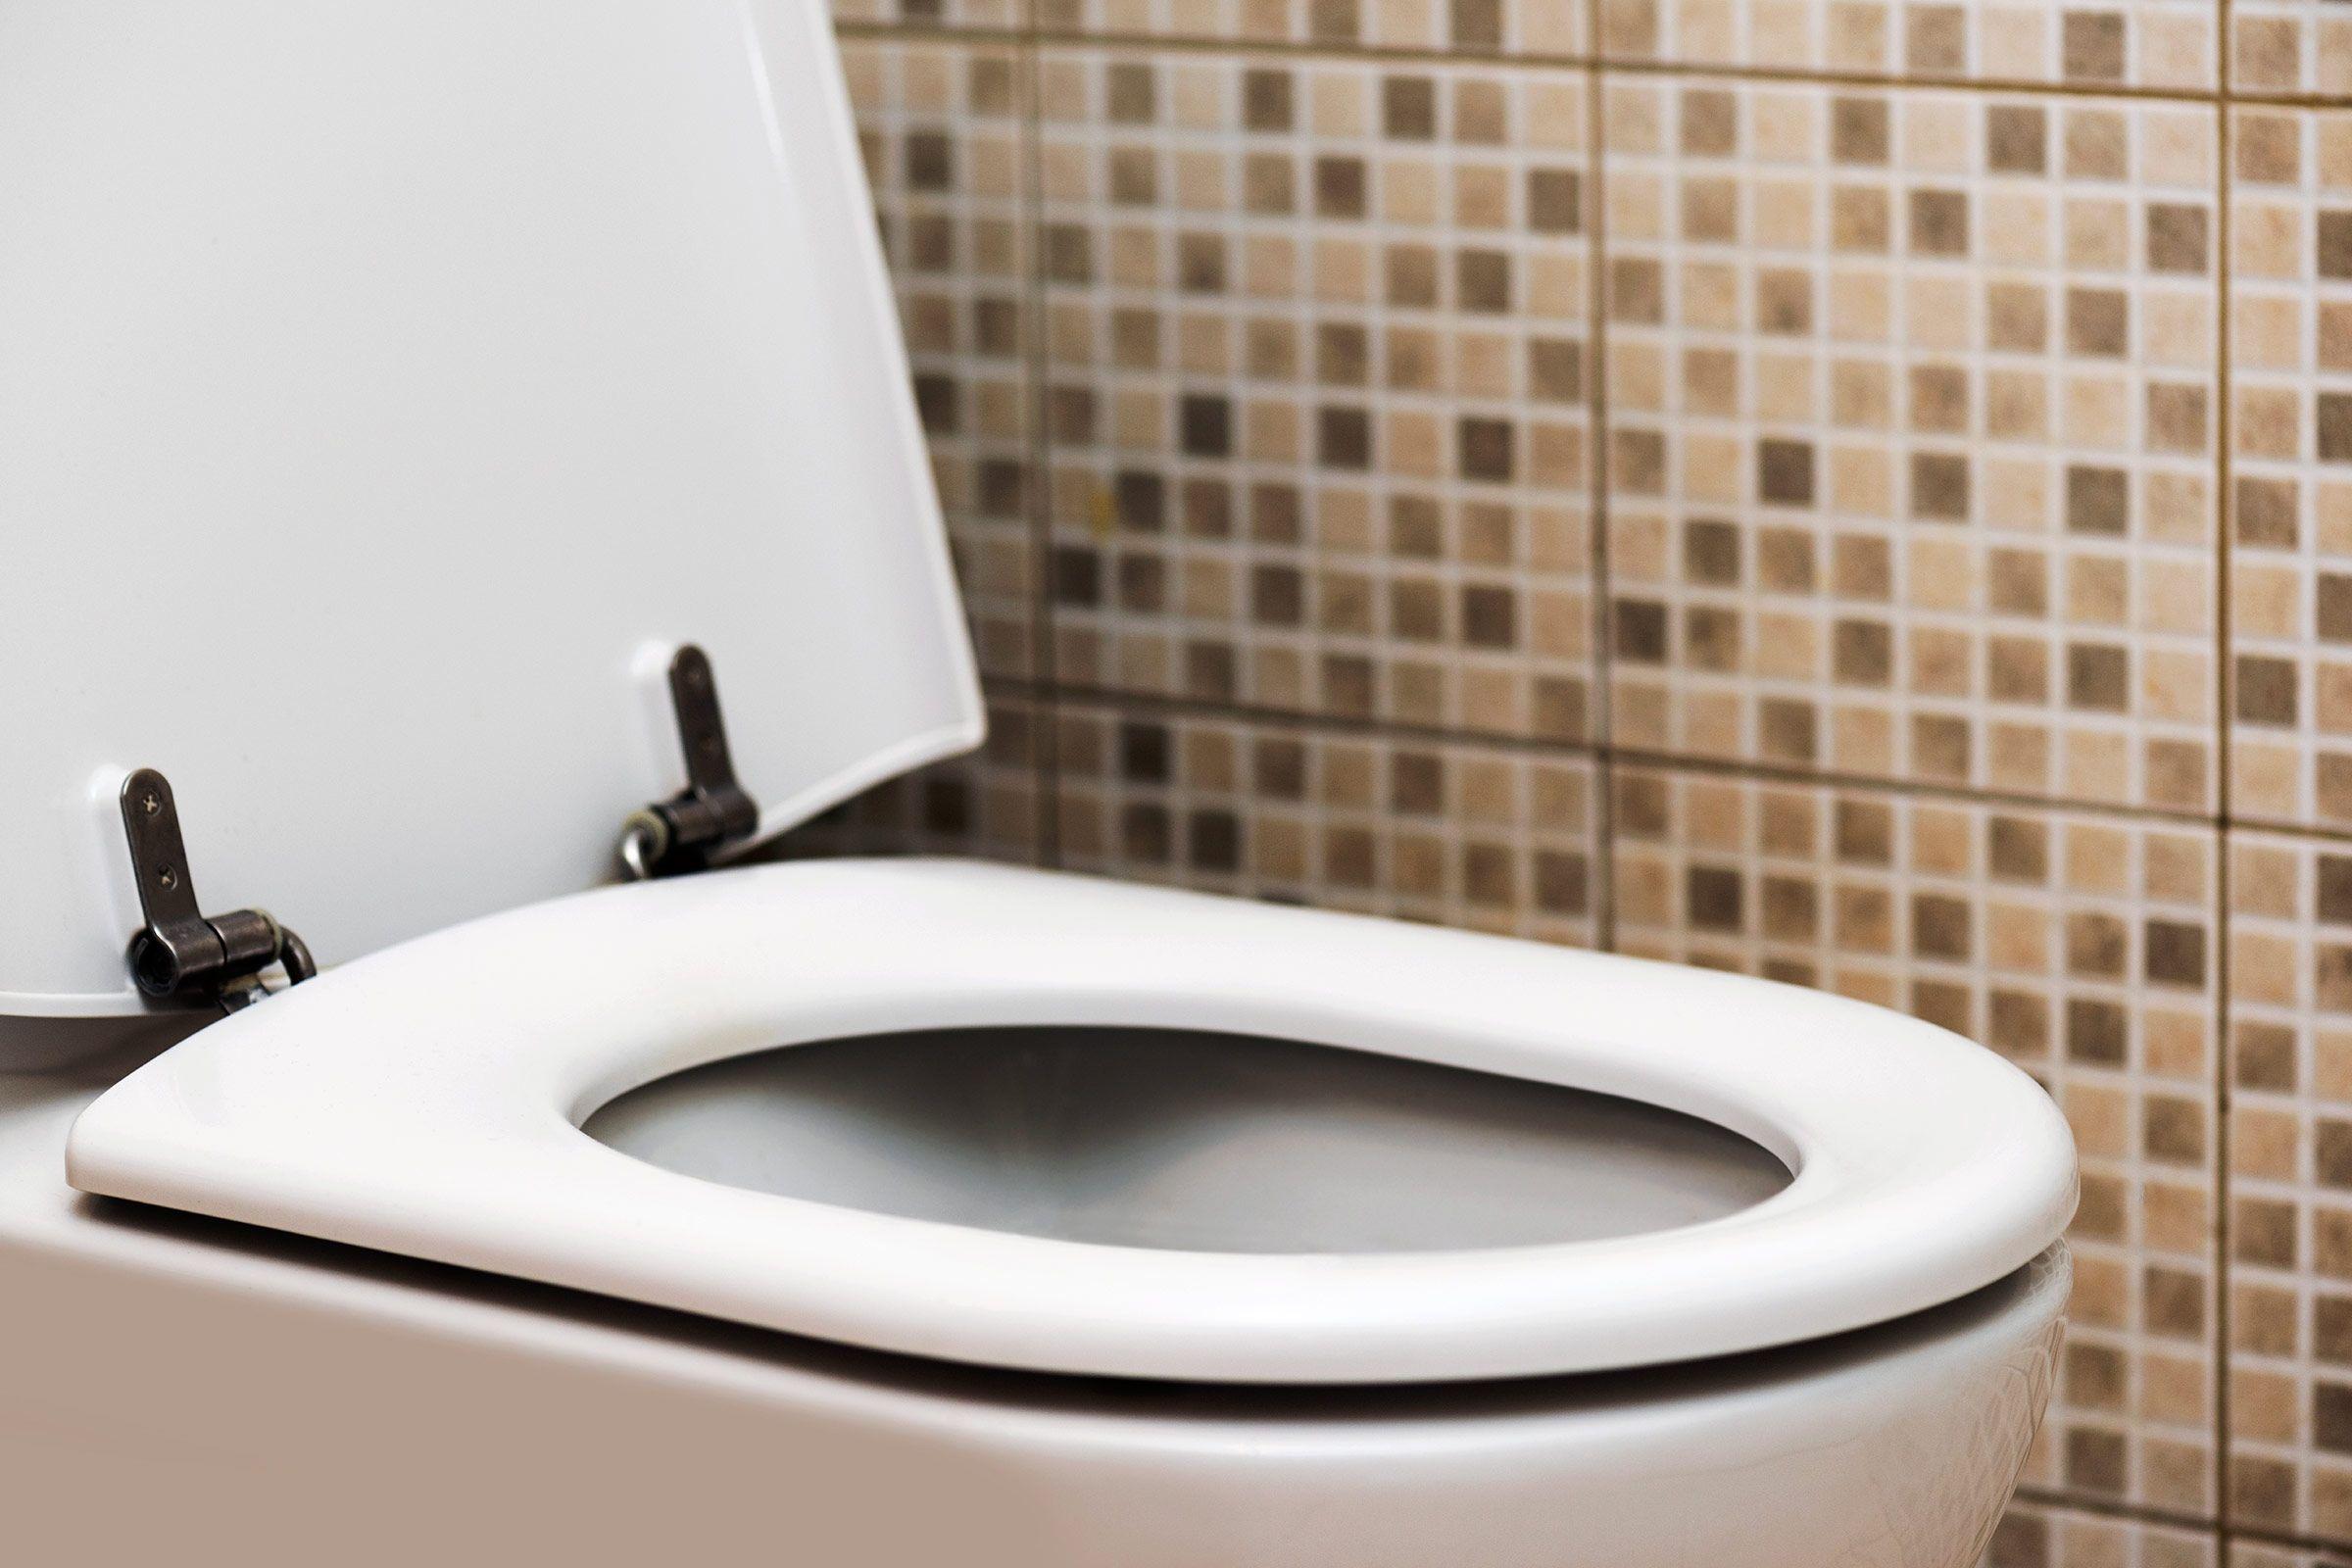 Musty Smell From Bathroom Sink Bathroom Exclusiv Pinterest Sinks - Musty smell in bathroom